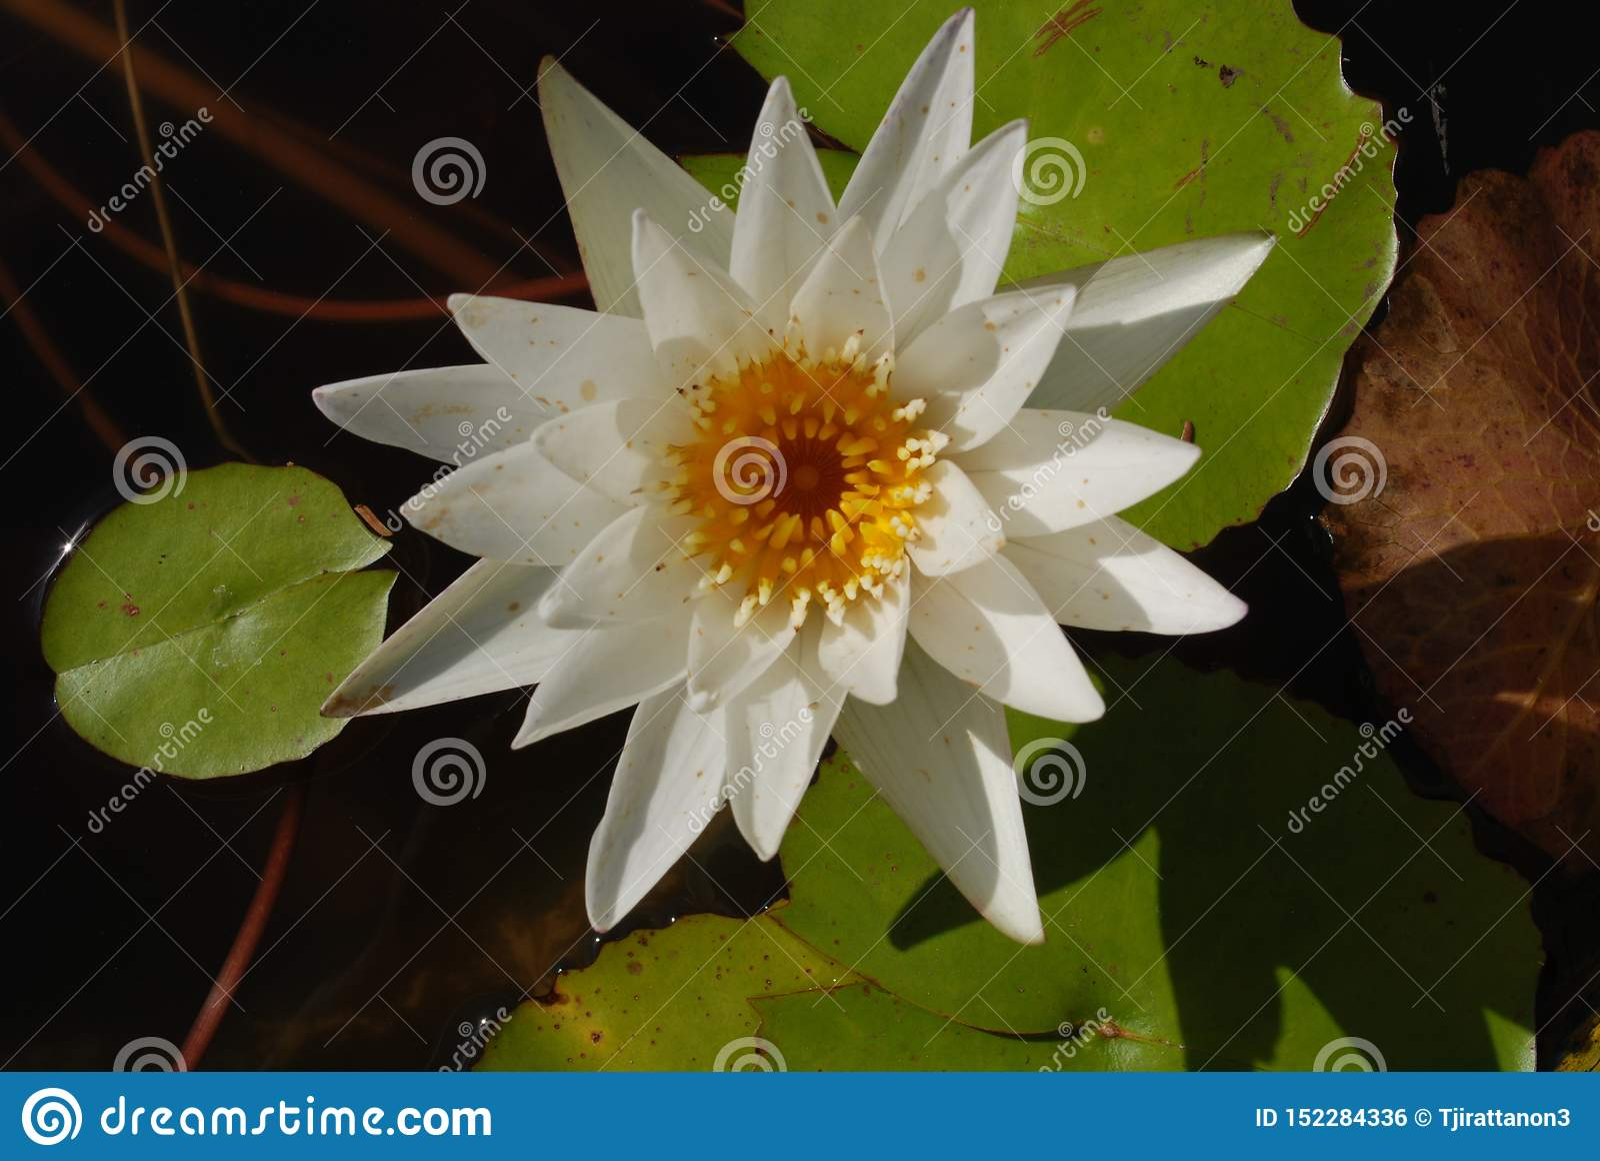 Thailand lotus of freshness, beautiful, happy